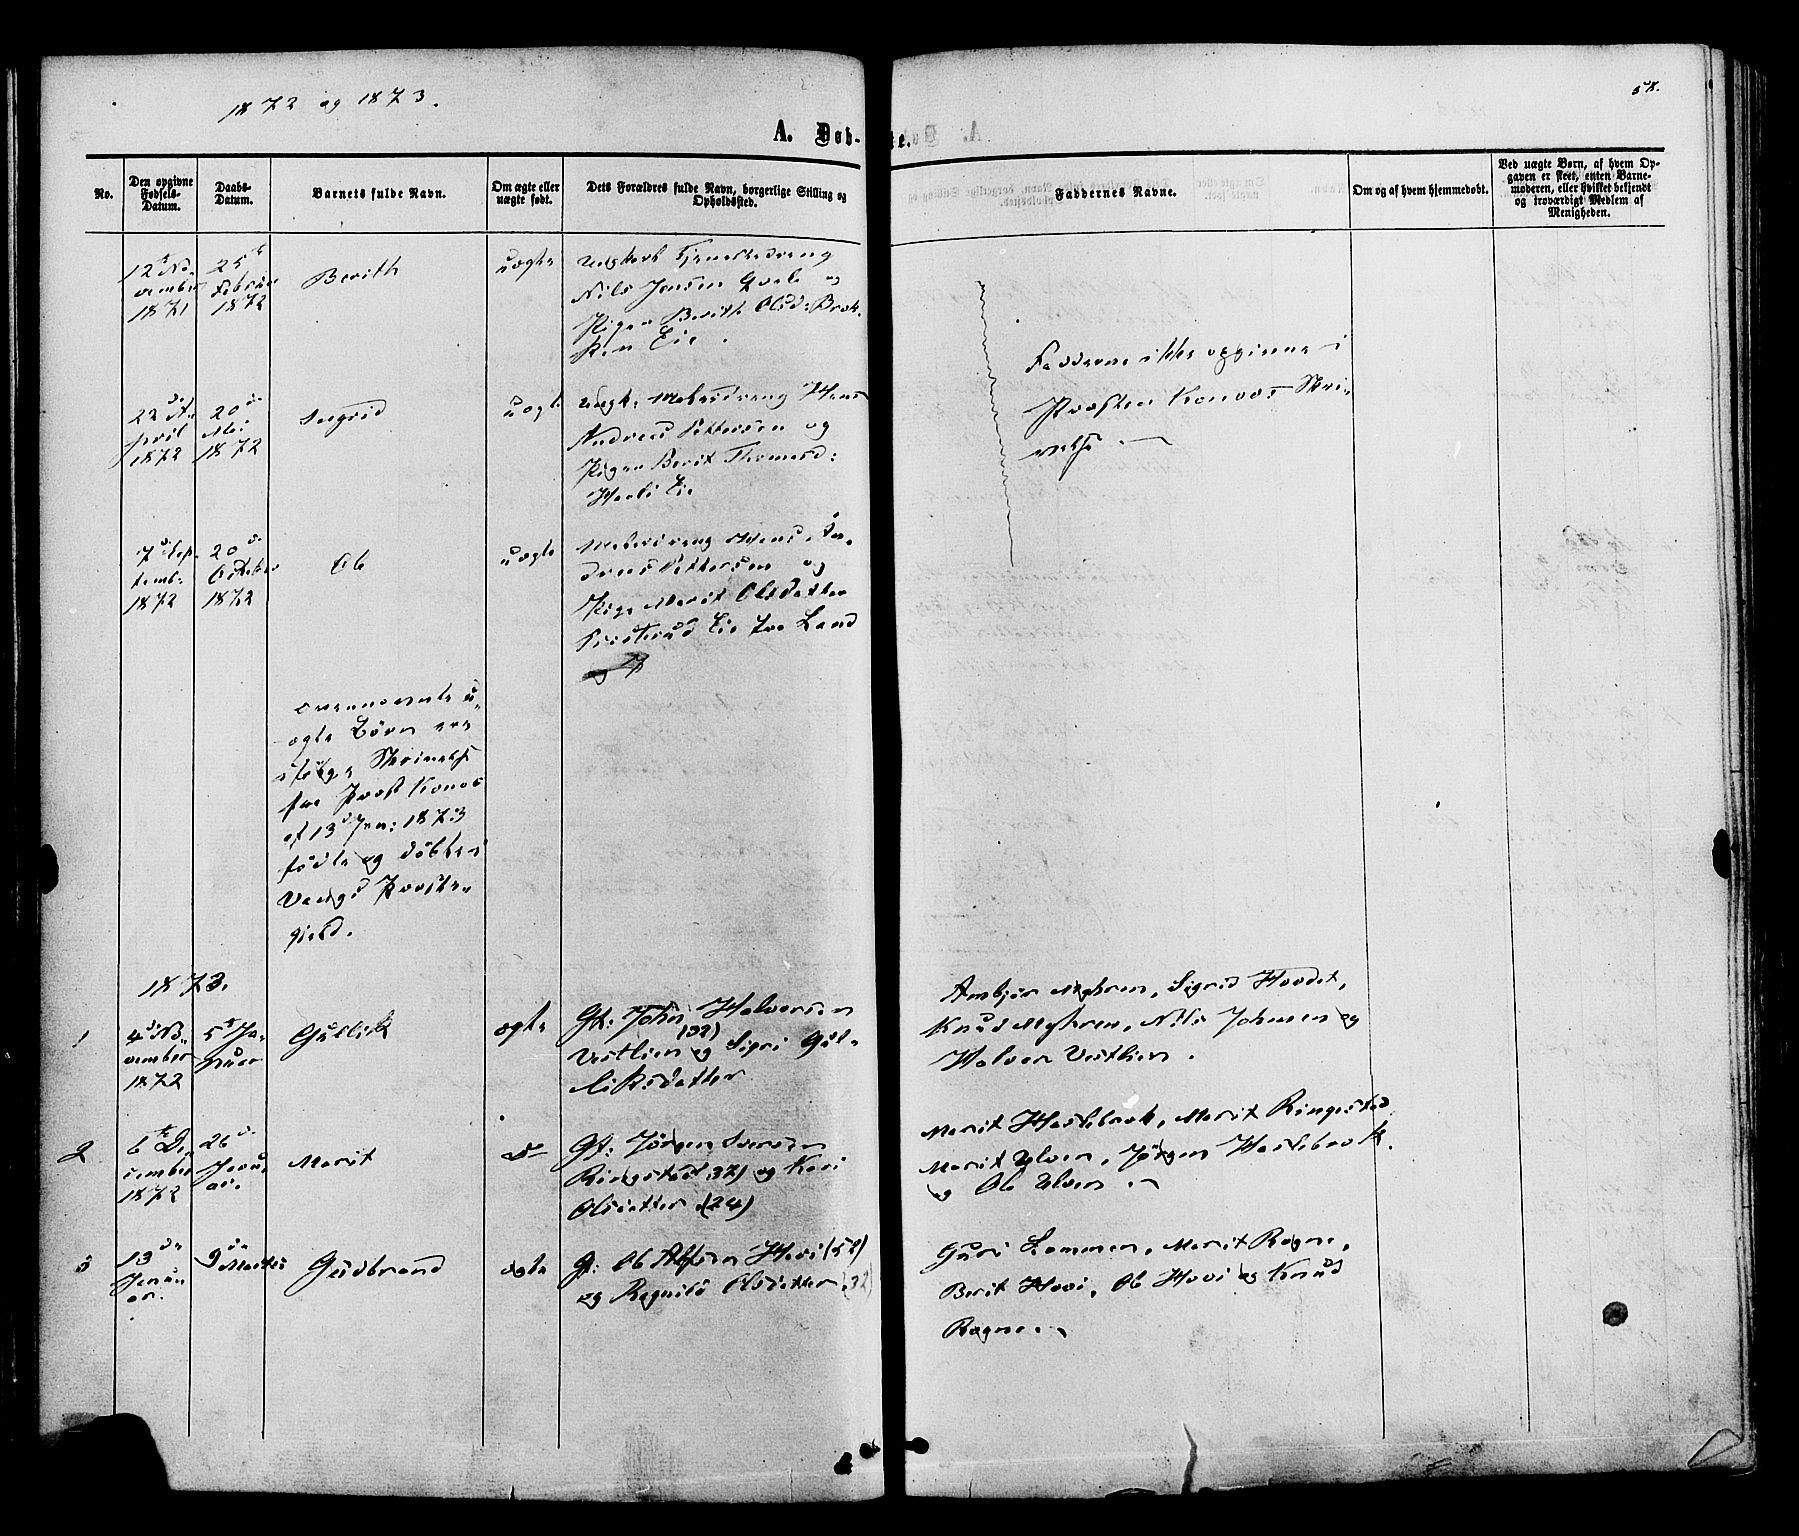 SAH, Vestre Slidre prestekontor, Ministerialbok nr. 3, 1865-1880, s. 58